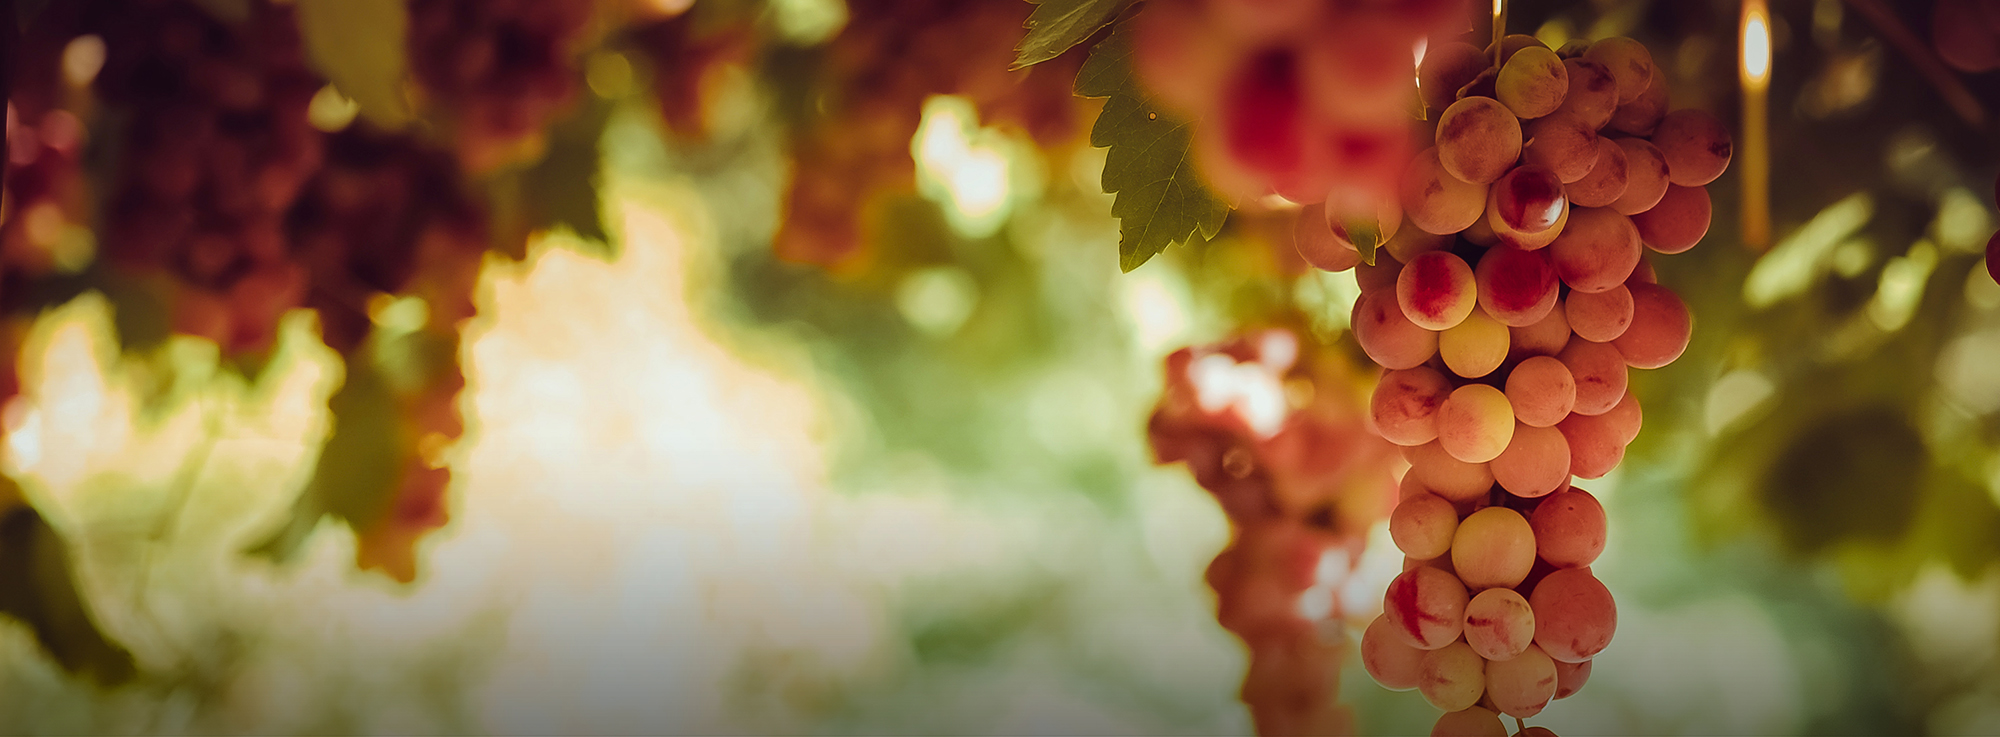 Carapelle, Ordona, Orta Nova, Stornara e Stornarella: Pellegrini del Vino